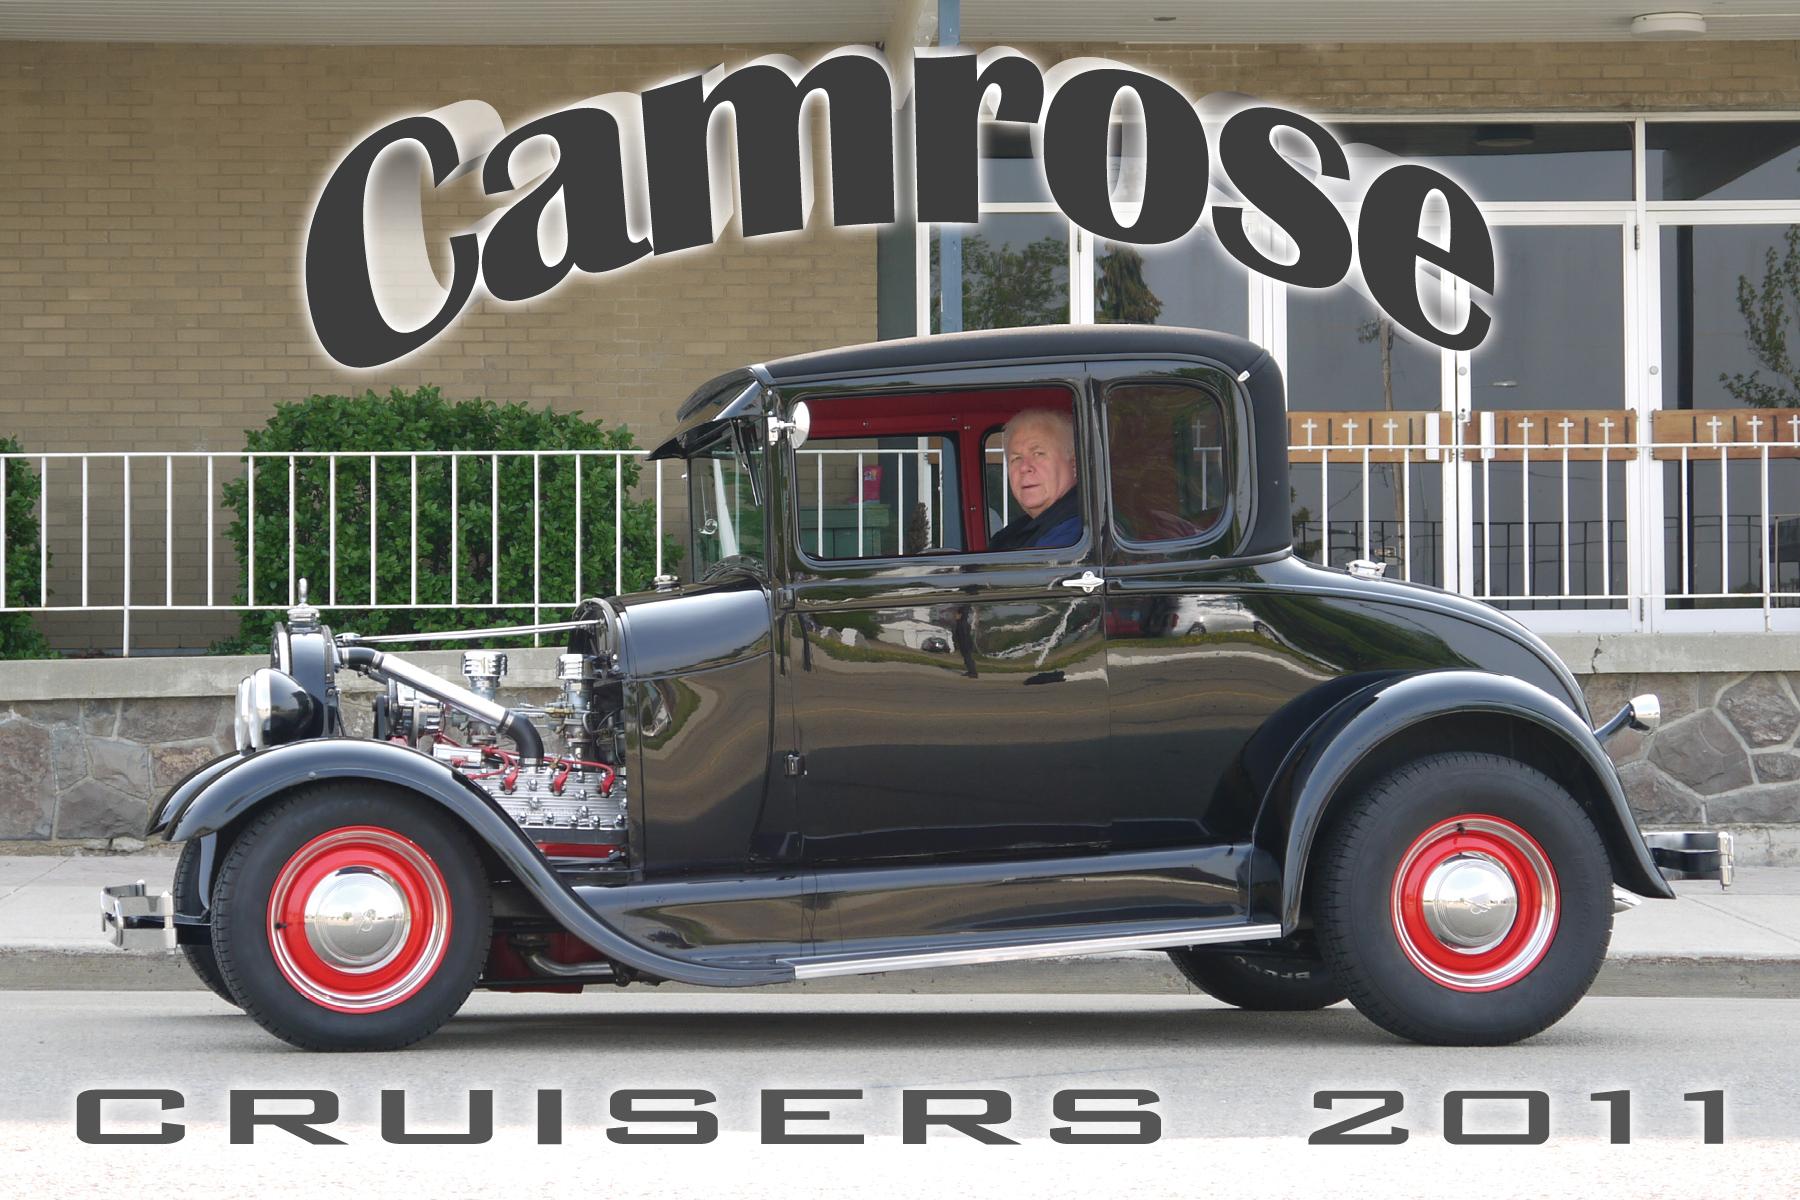 20110528_CamCruisers24.jpg